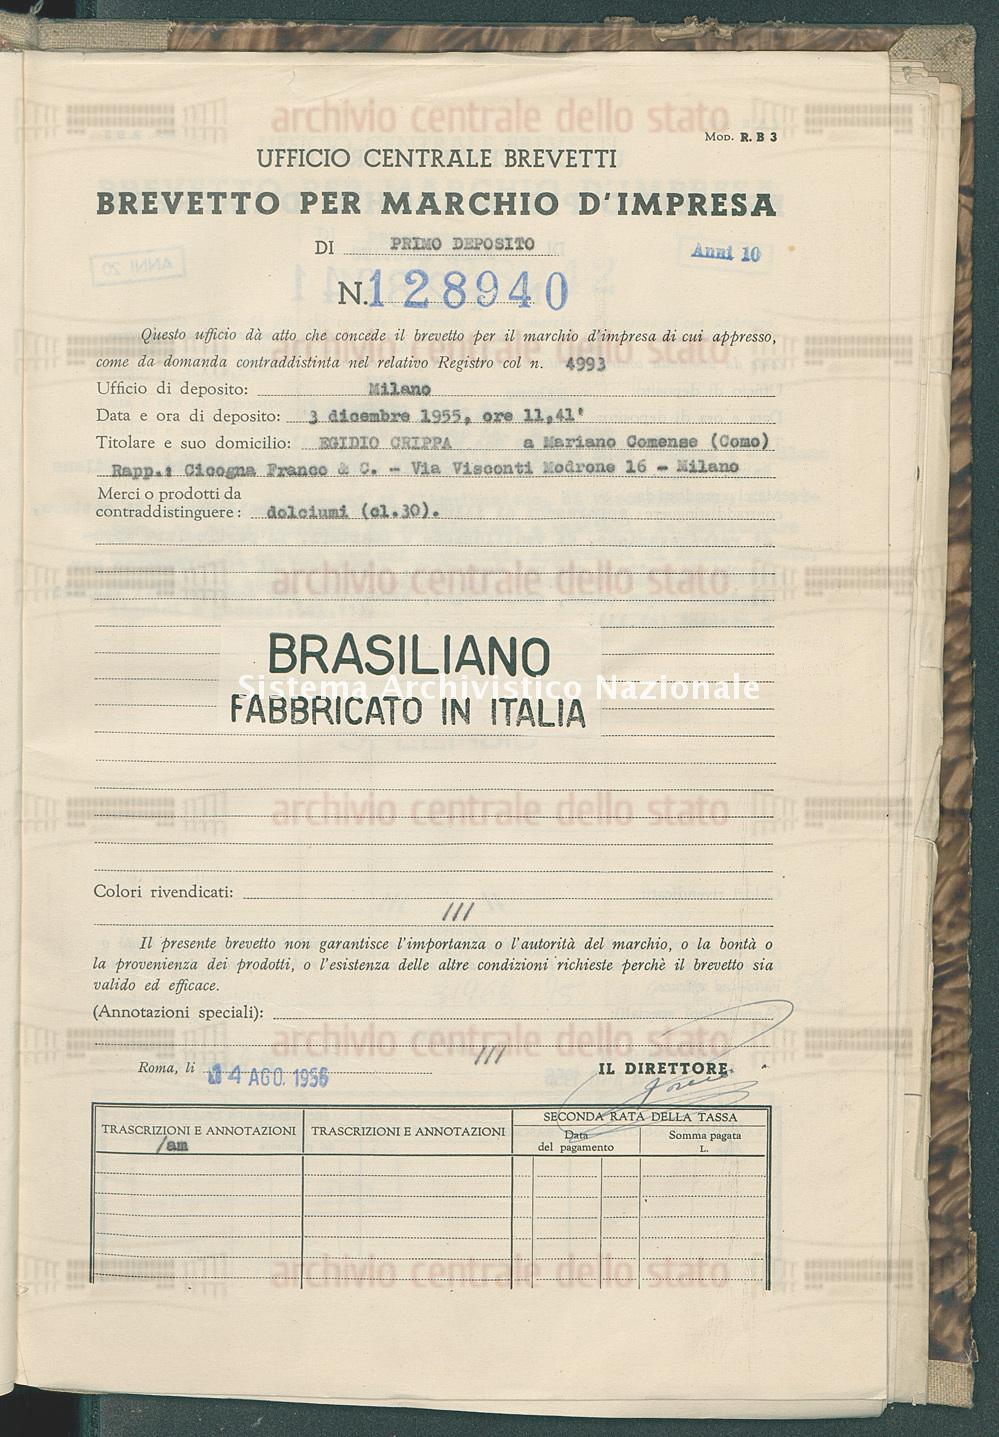 Egidio Crippa (14/08/1956)